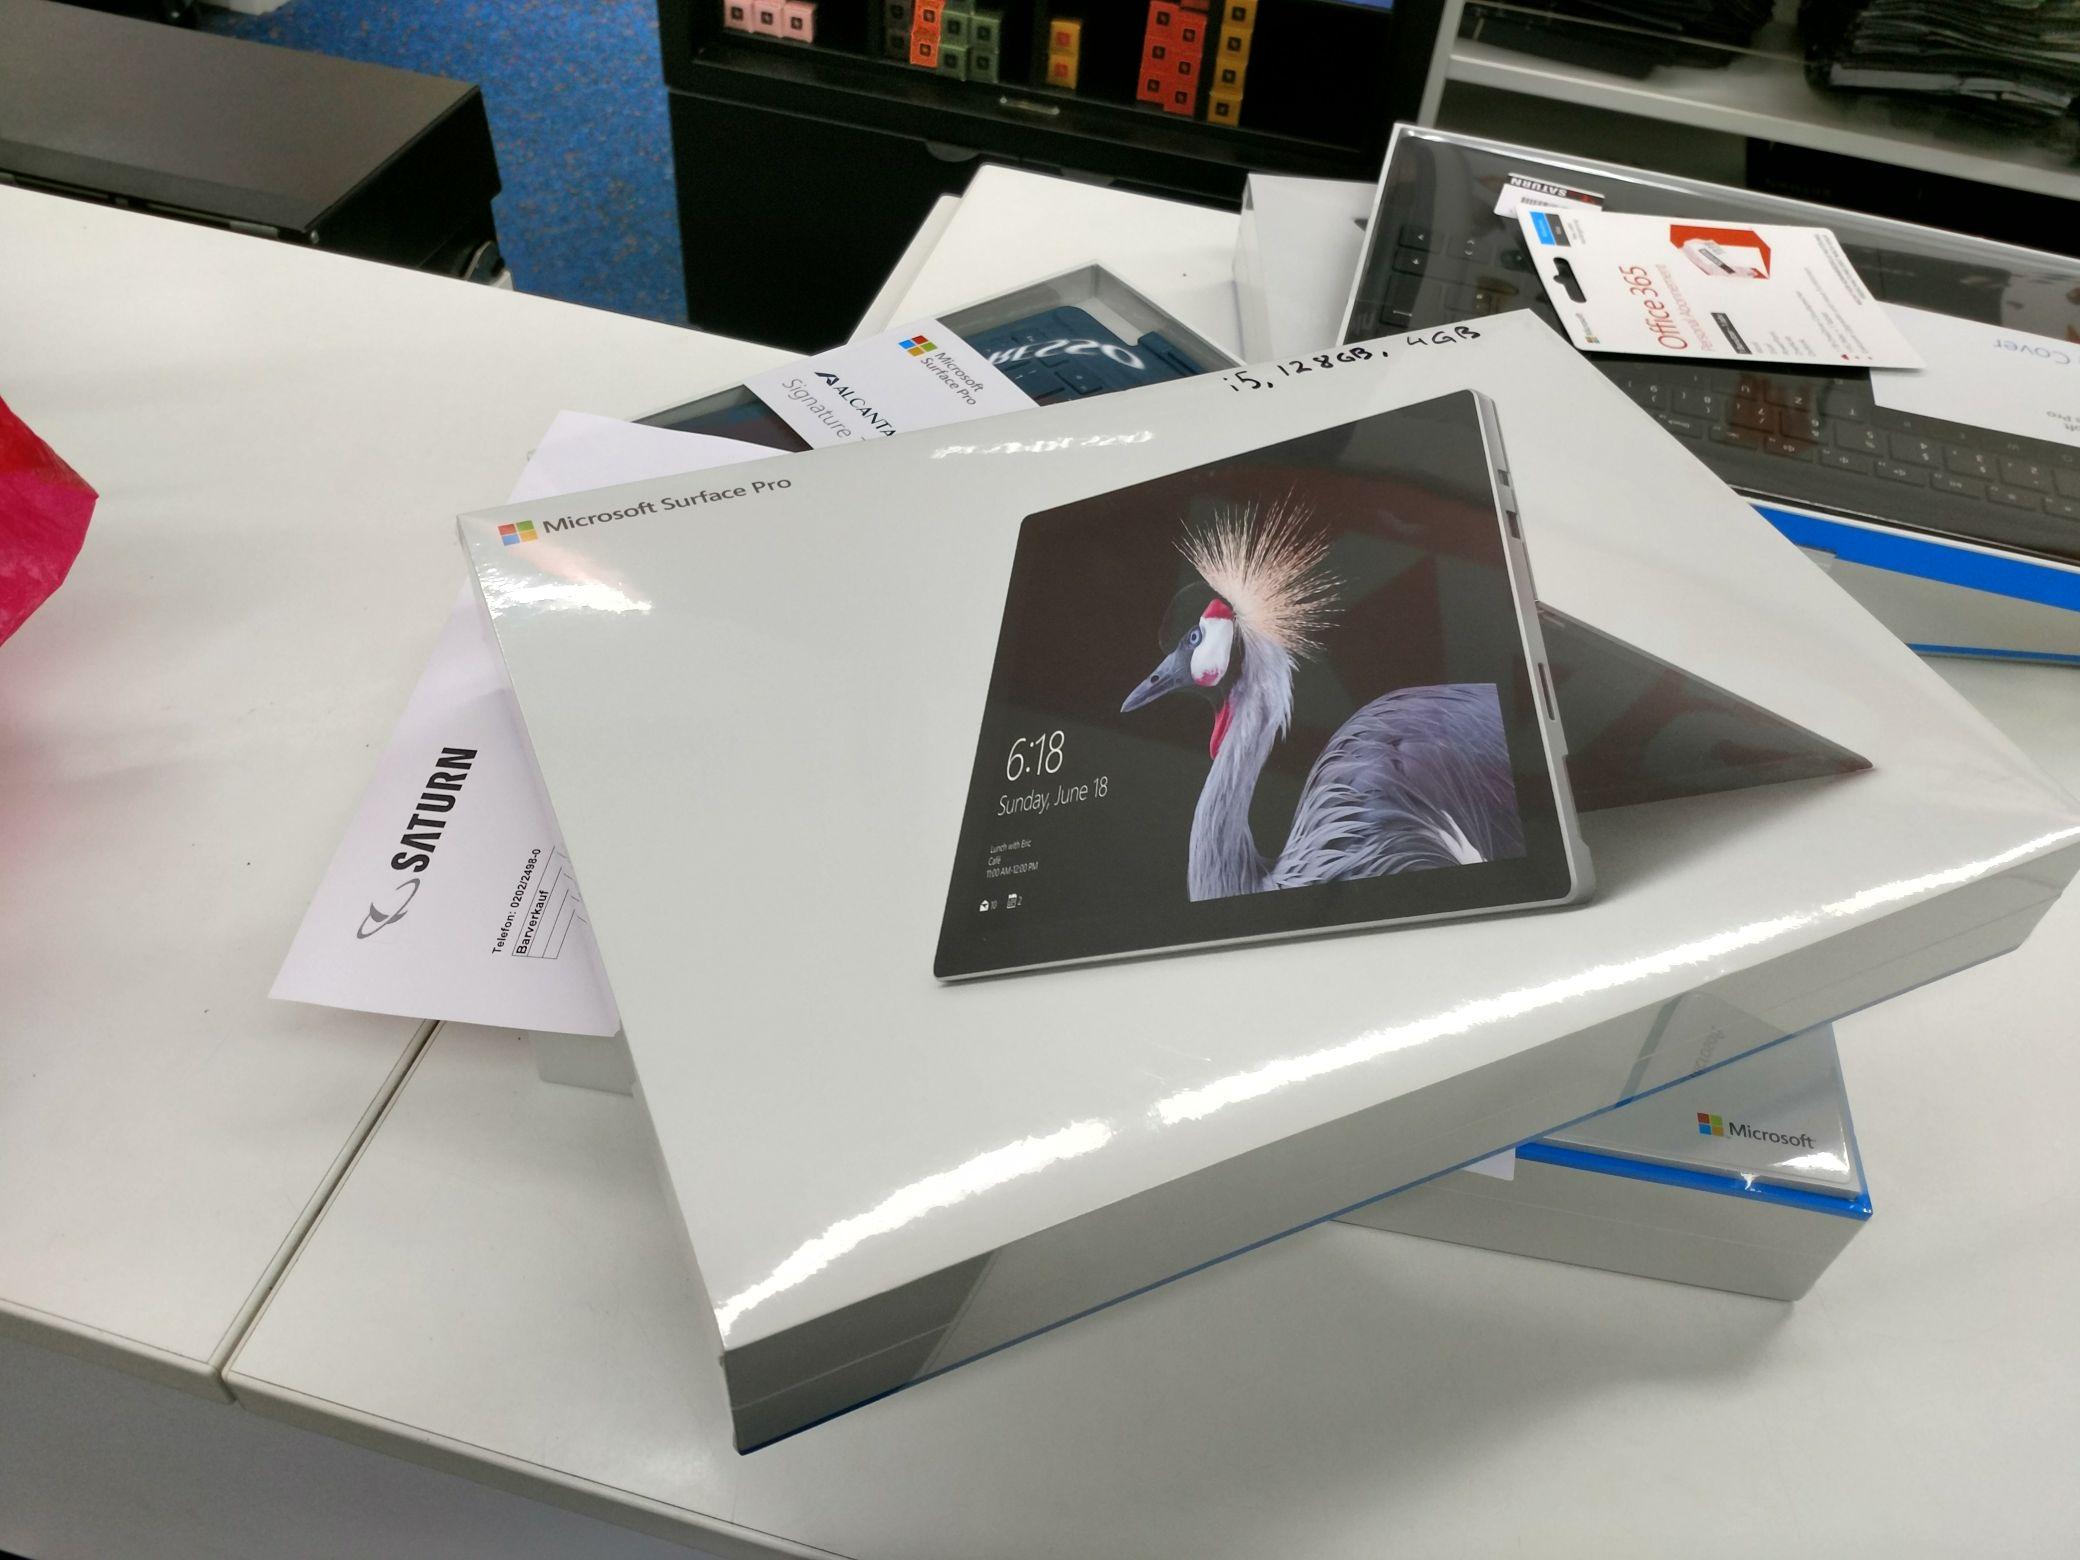 Amazon/Saturn/MM Microsoft Surface Pro (12,3 Zoll, Intel Core i5 der 7. Gen, 4 GB RAM, 128 GB SSD, Windows 10 Pro)